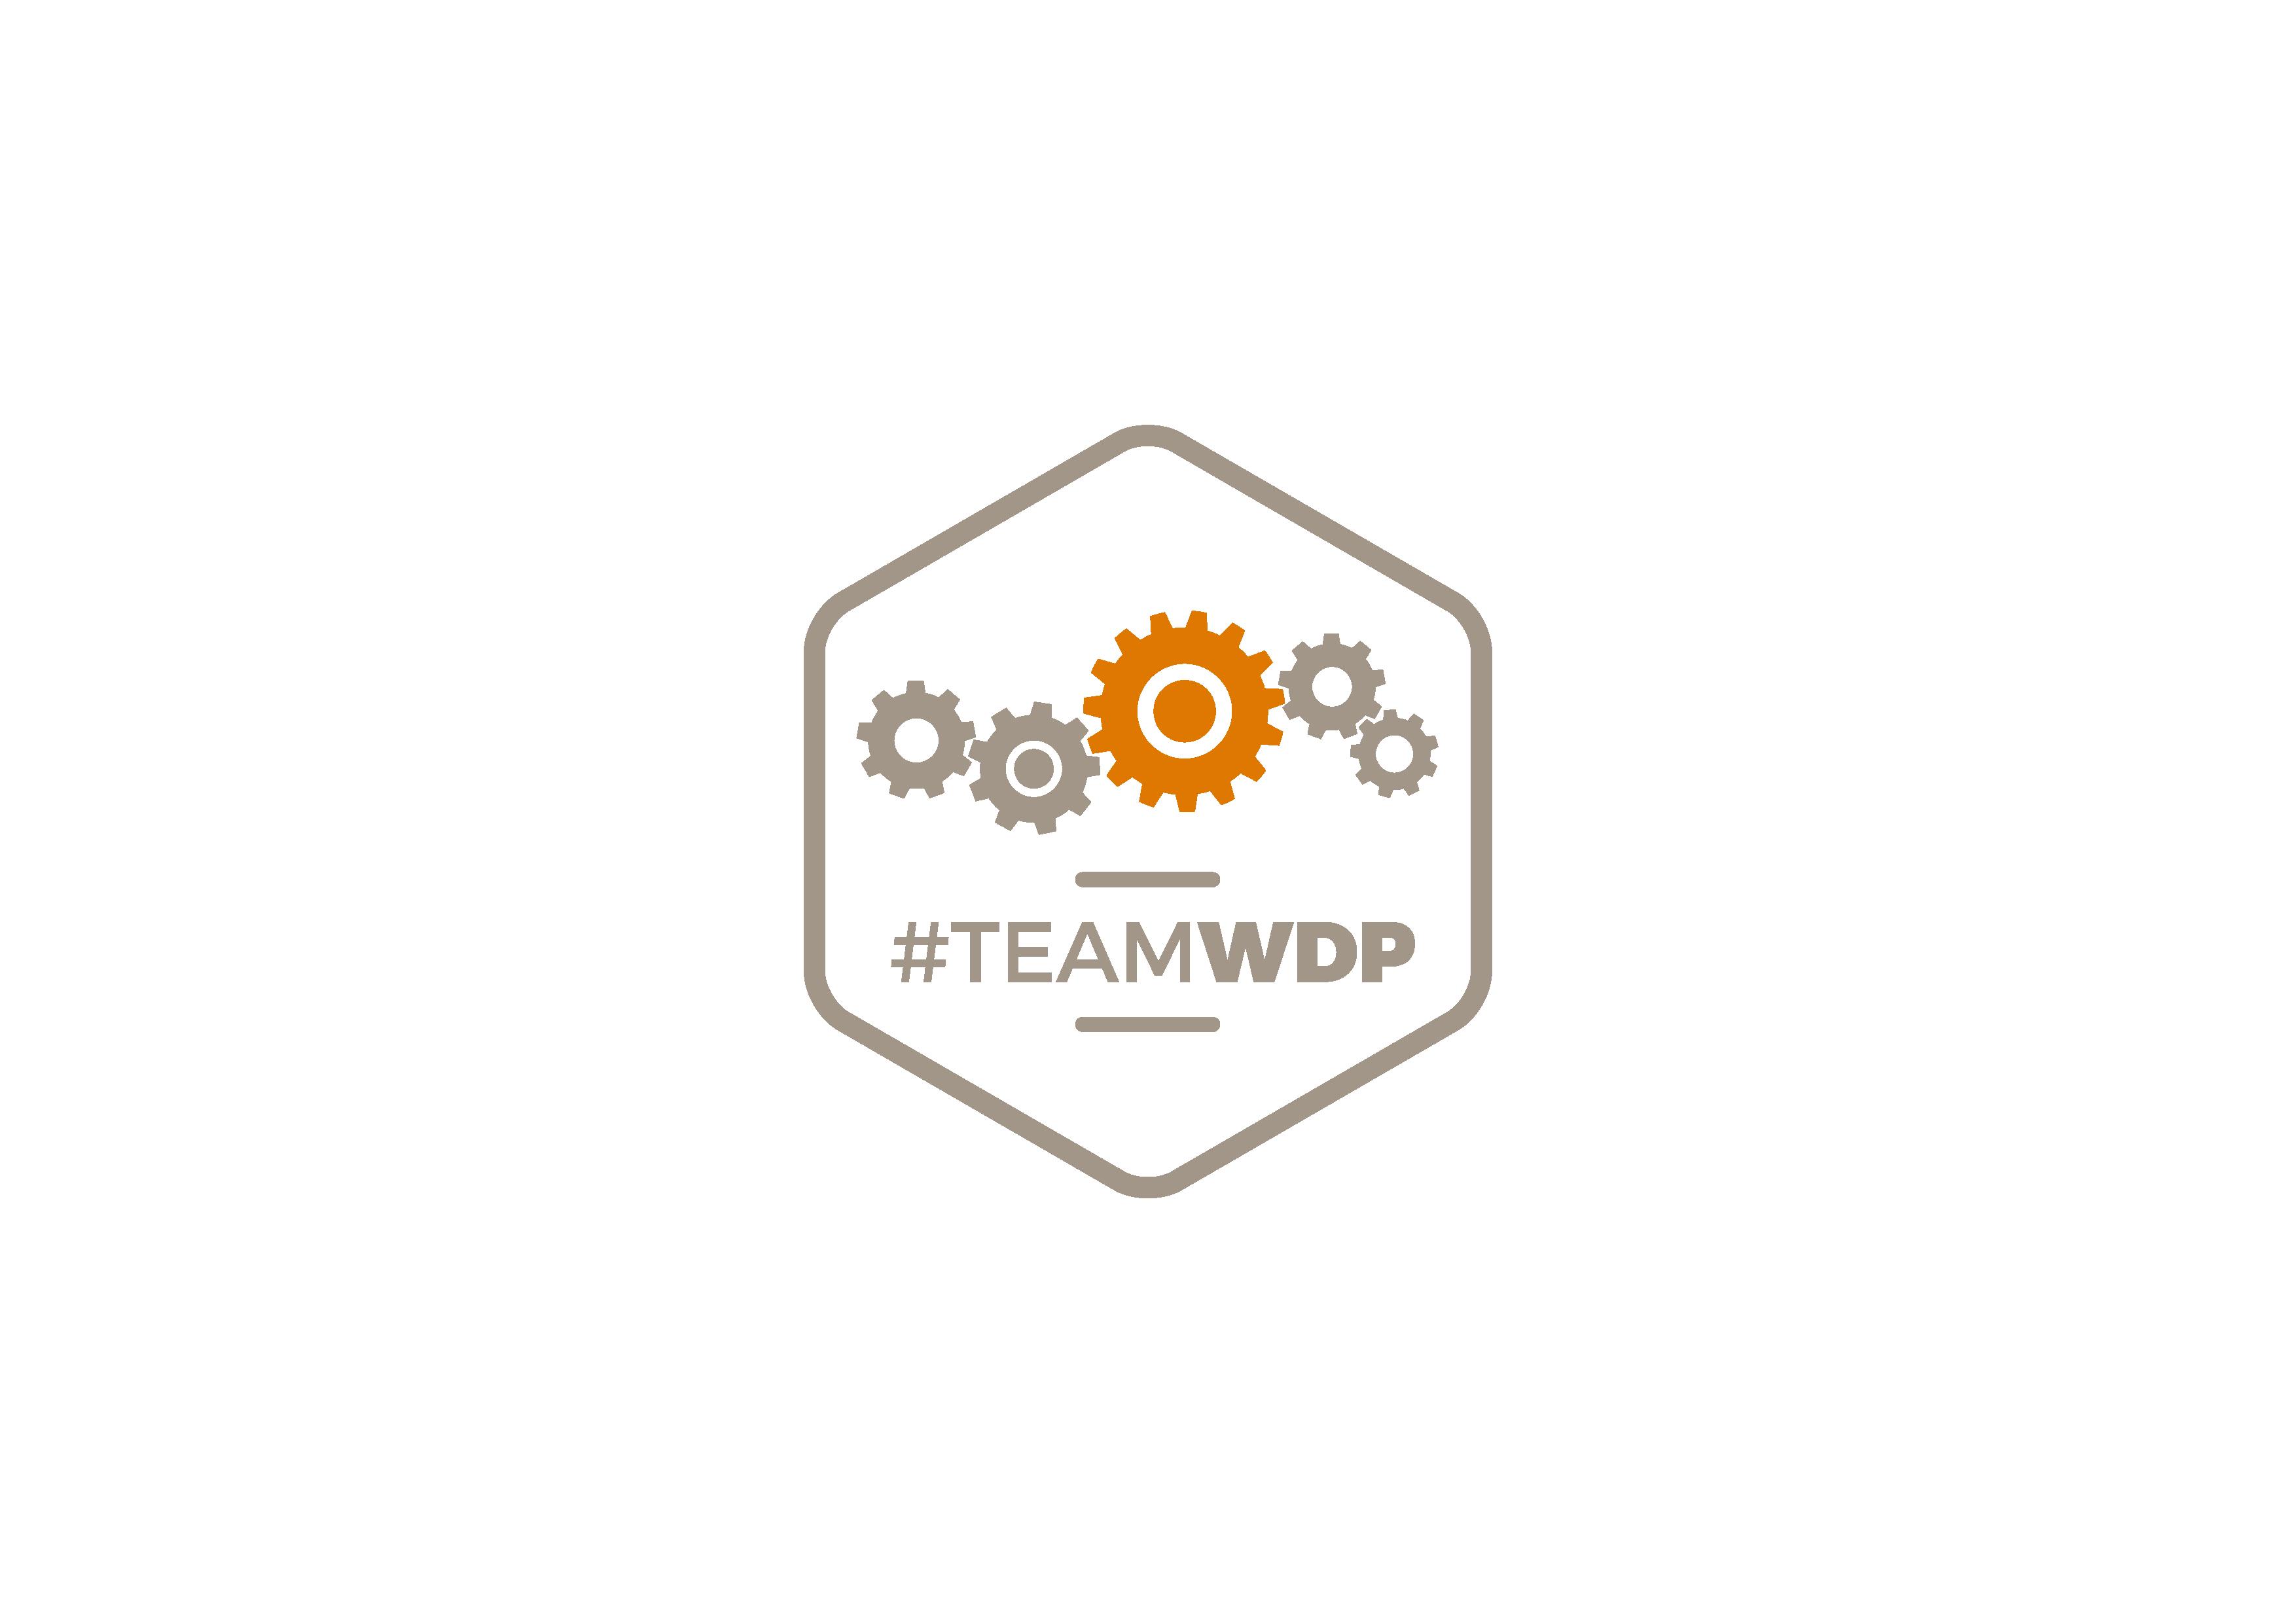 #TeamWDP